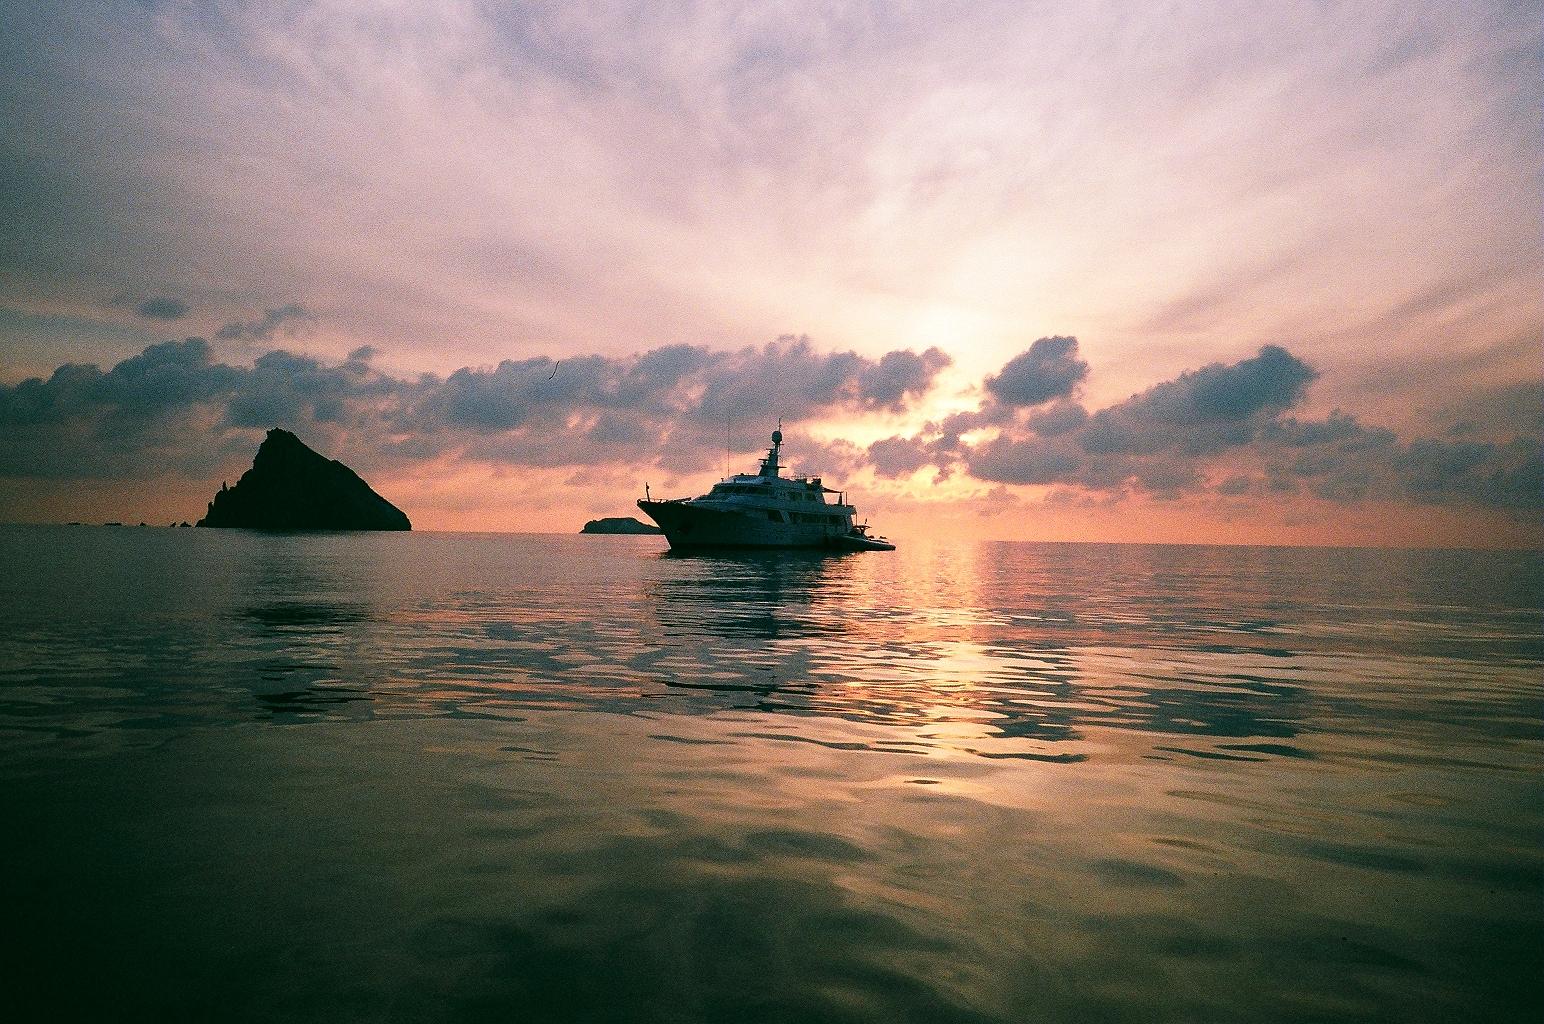 sandy-ley-catamaran-sailing-aeolian-islands-italy